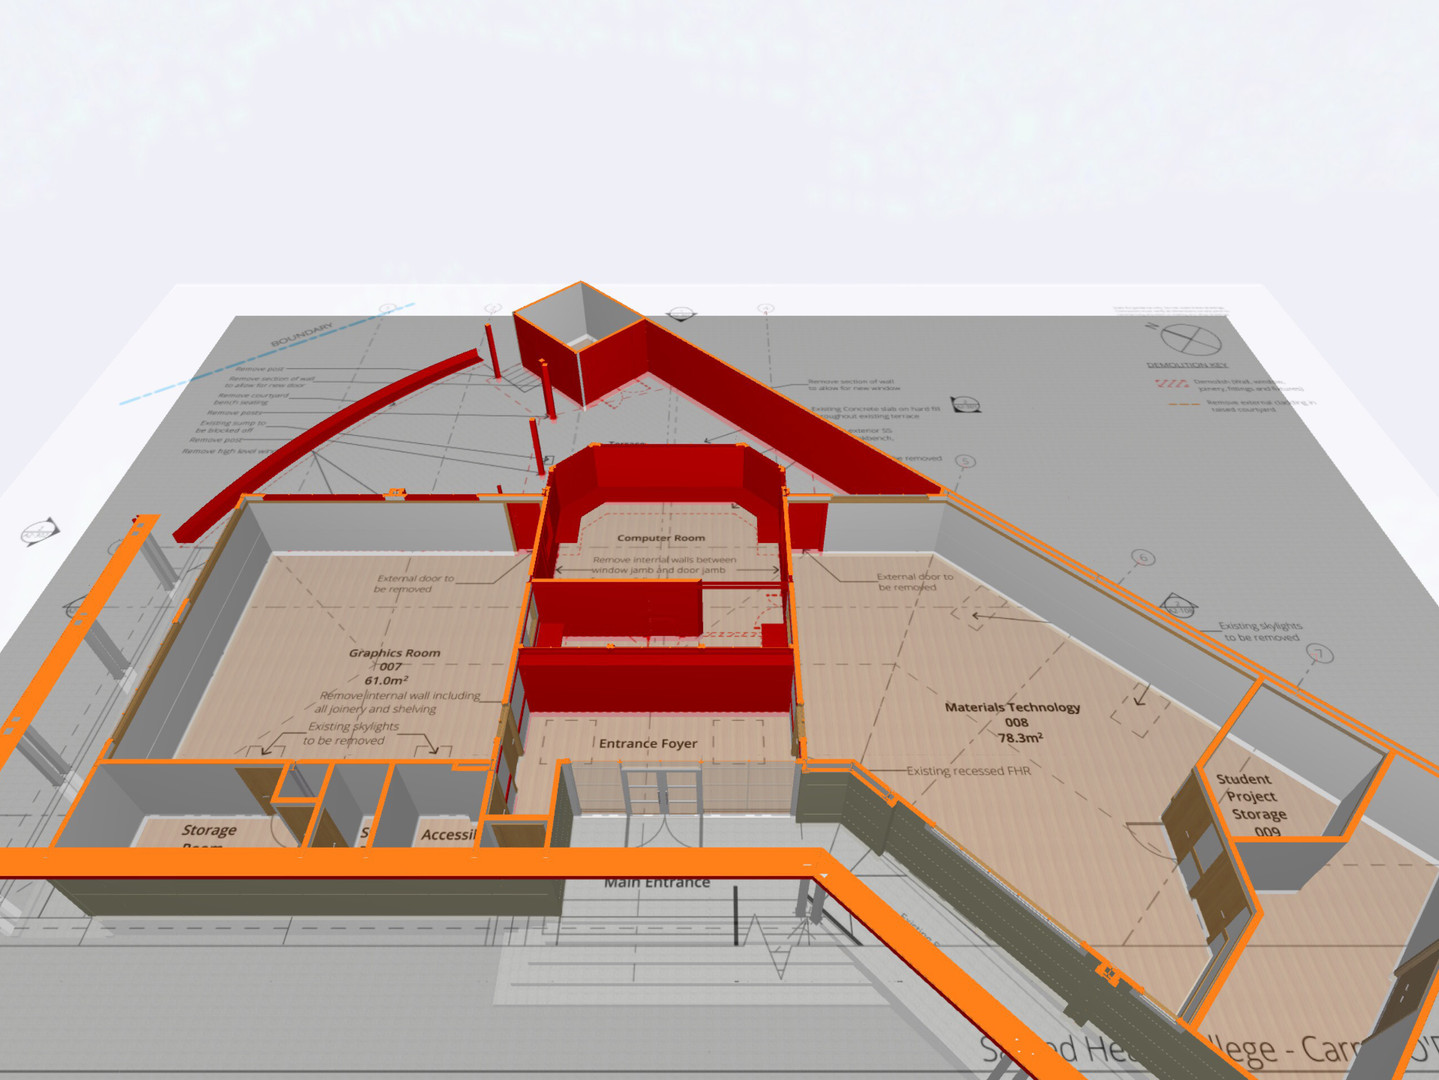 Sacred-Heart-College-Carrol-O'Donovan-5-3D-existing-plan.jpeg